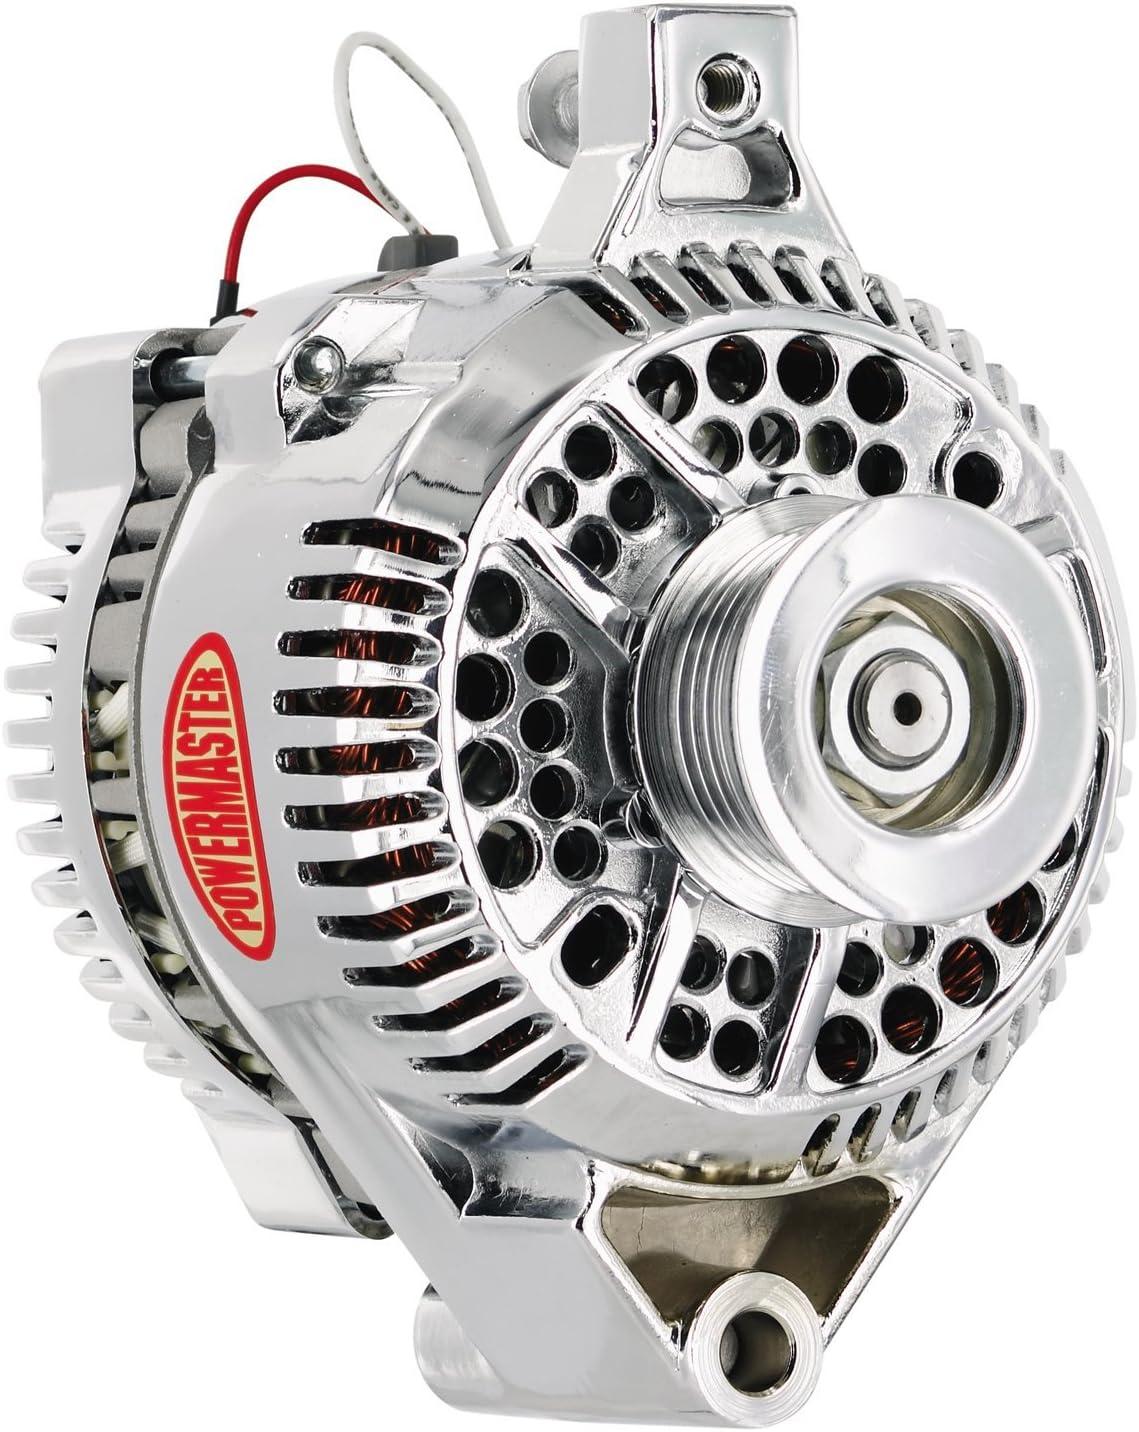 [SCHEMATICS_48ZD]  Amazon.com: Powermaster 177491 Chrome Ford 3G One Wire Alternator 100A:  Automotive | Ford Powermaster Alternators Wiring |  | Amazon.com